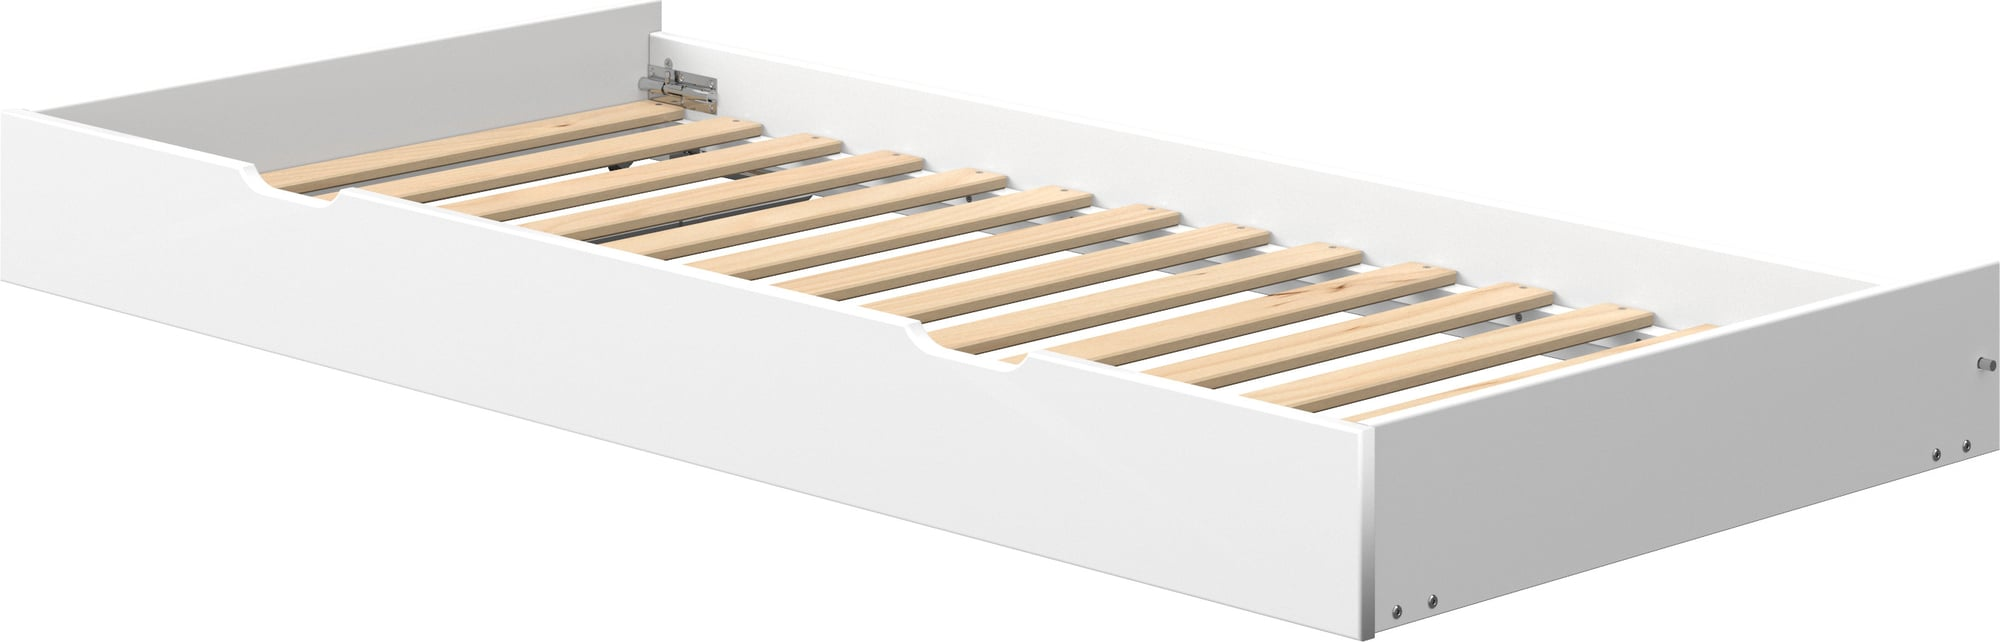 Full Size of Bett Mit Ausziehbett Flexa White Interismo Onlineshop Tojo Holz L Küche Kochinsel Hoch Bettkasten 140x200 Schlafzimmer Komplett Lattenrost Und Matratze Bett Bett Mit Ausziehbett